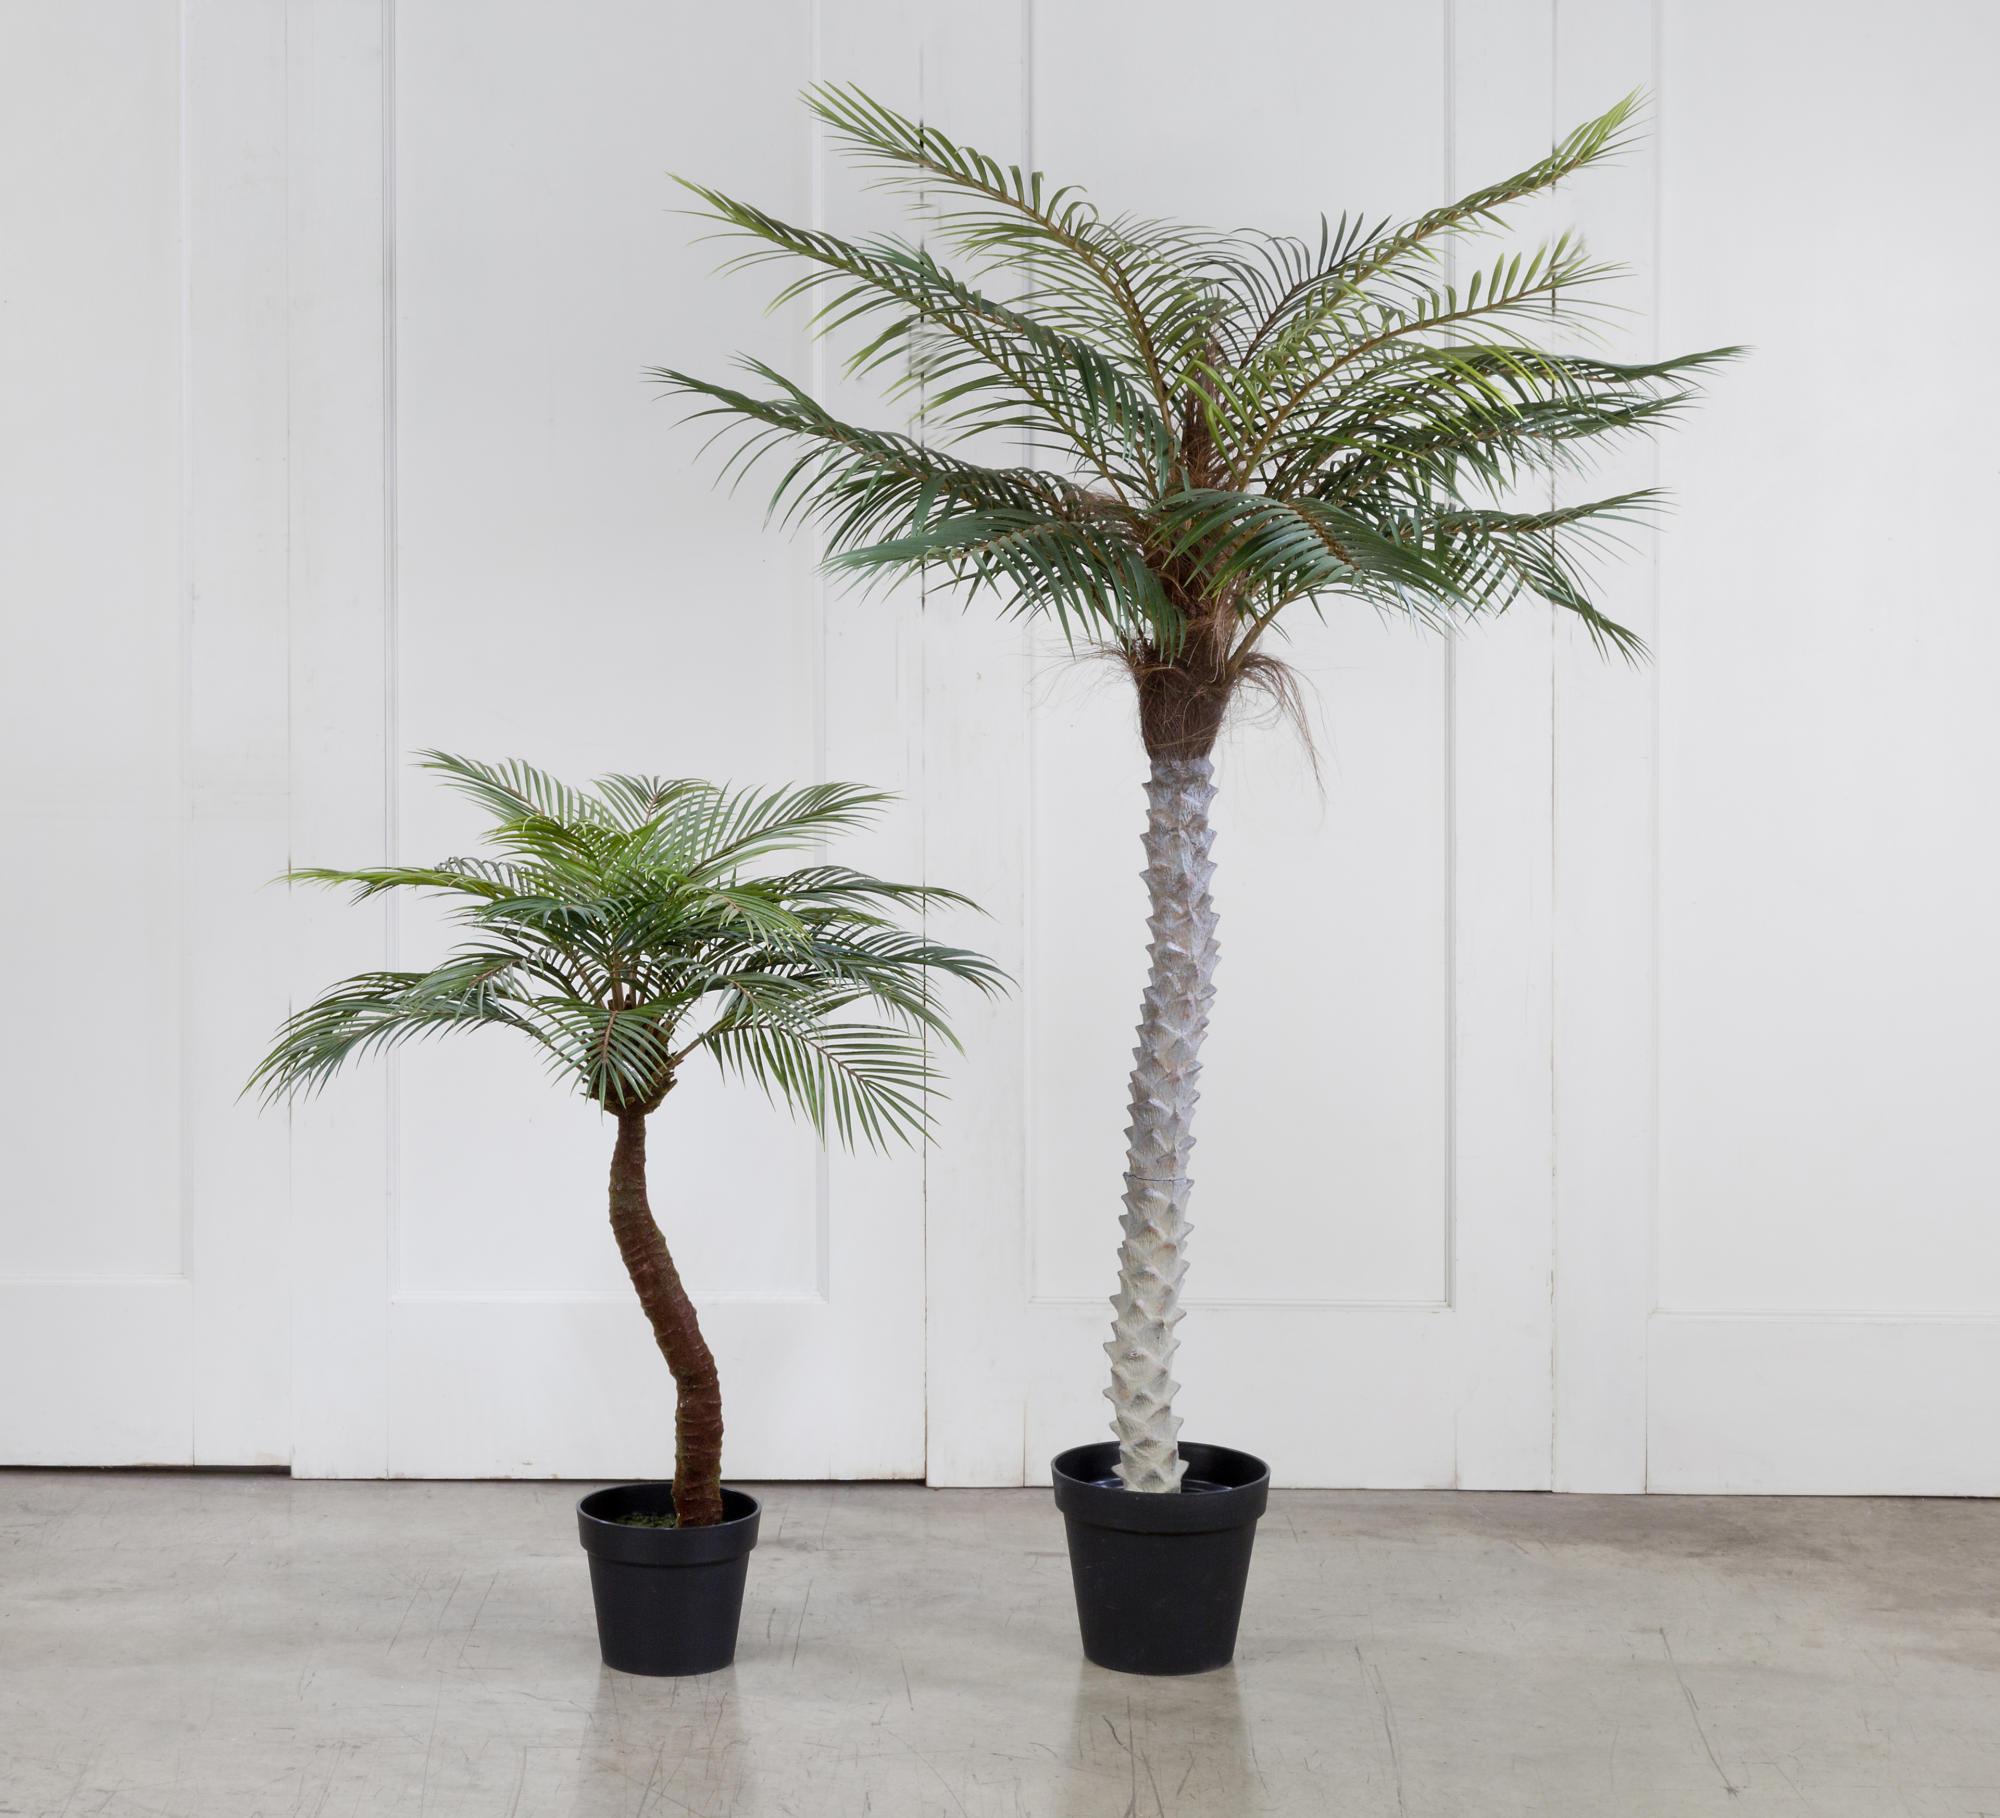 Decorative Palm Trees In Black Pots Tripar International